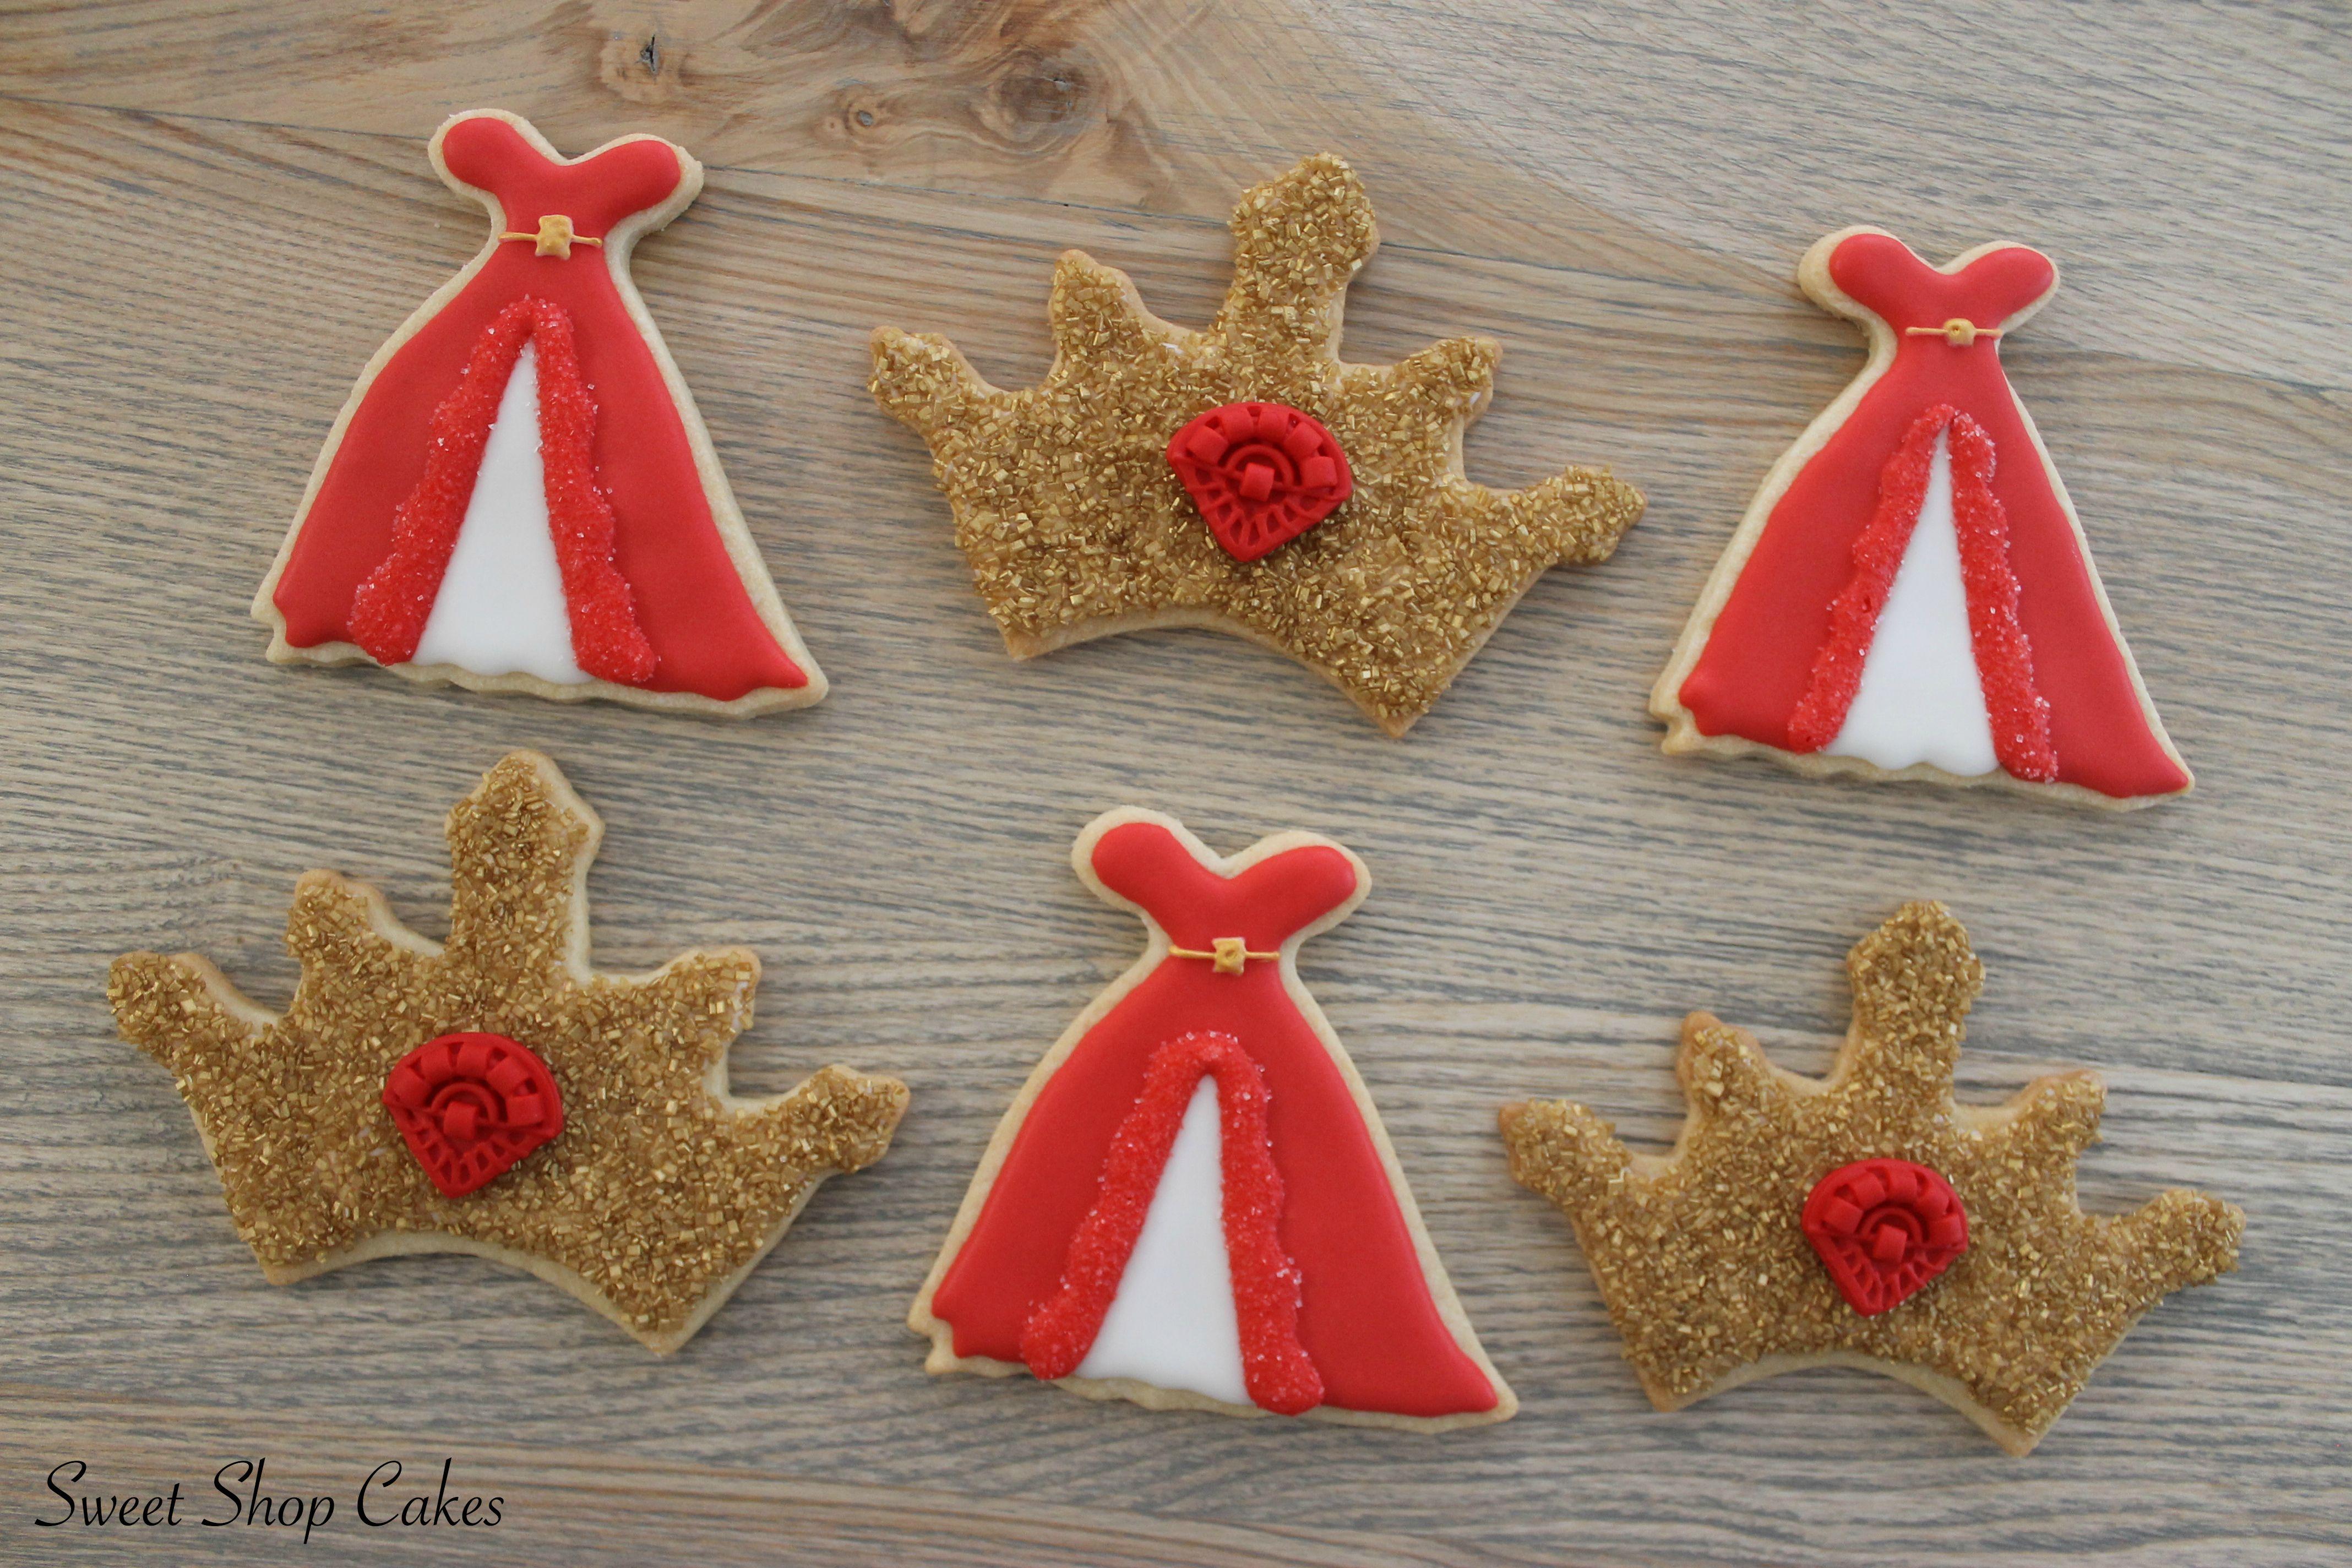 Princess Elena Of Avalor Themed Sugar Cookies